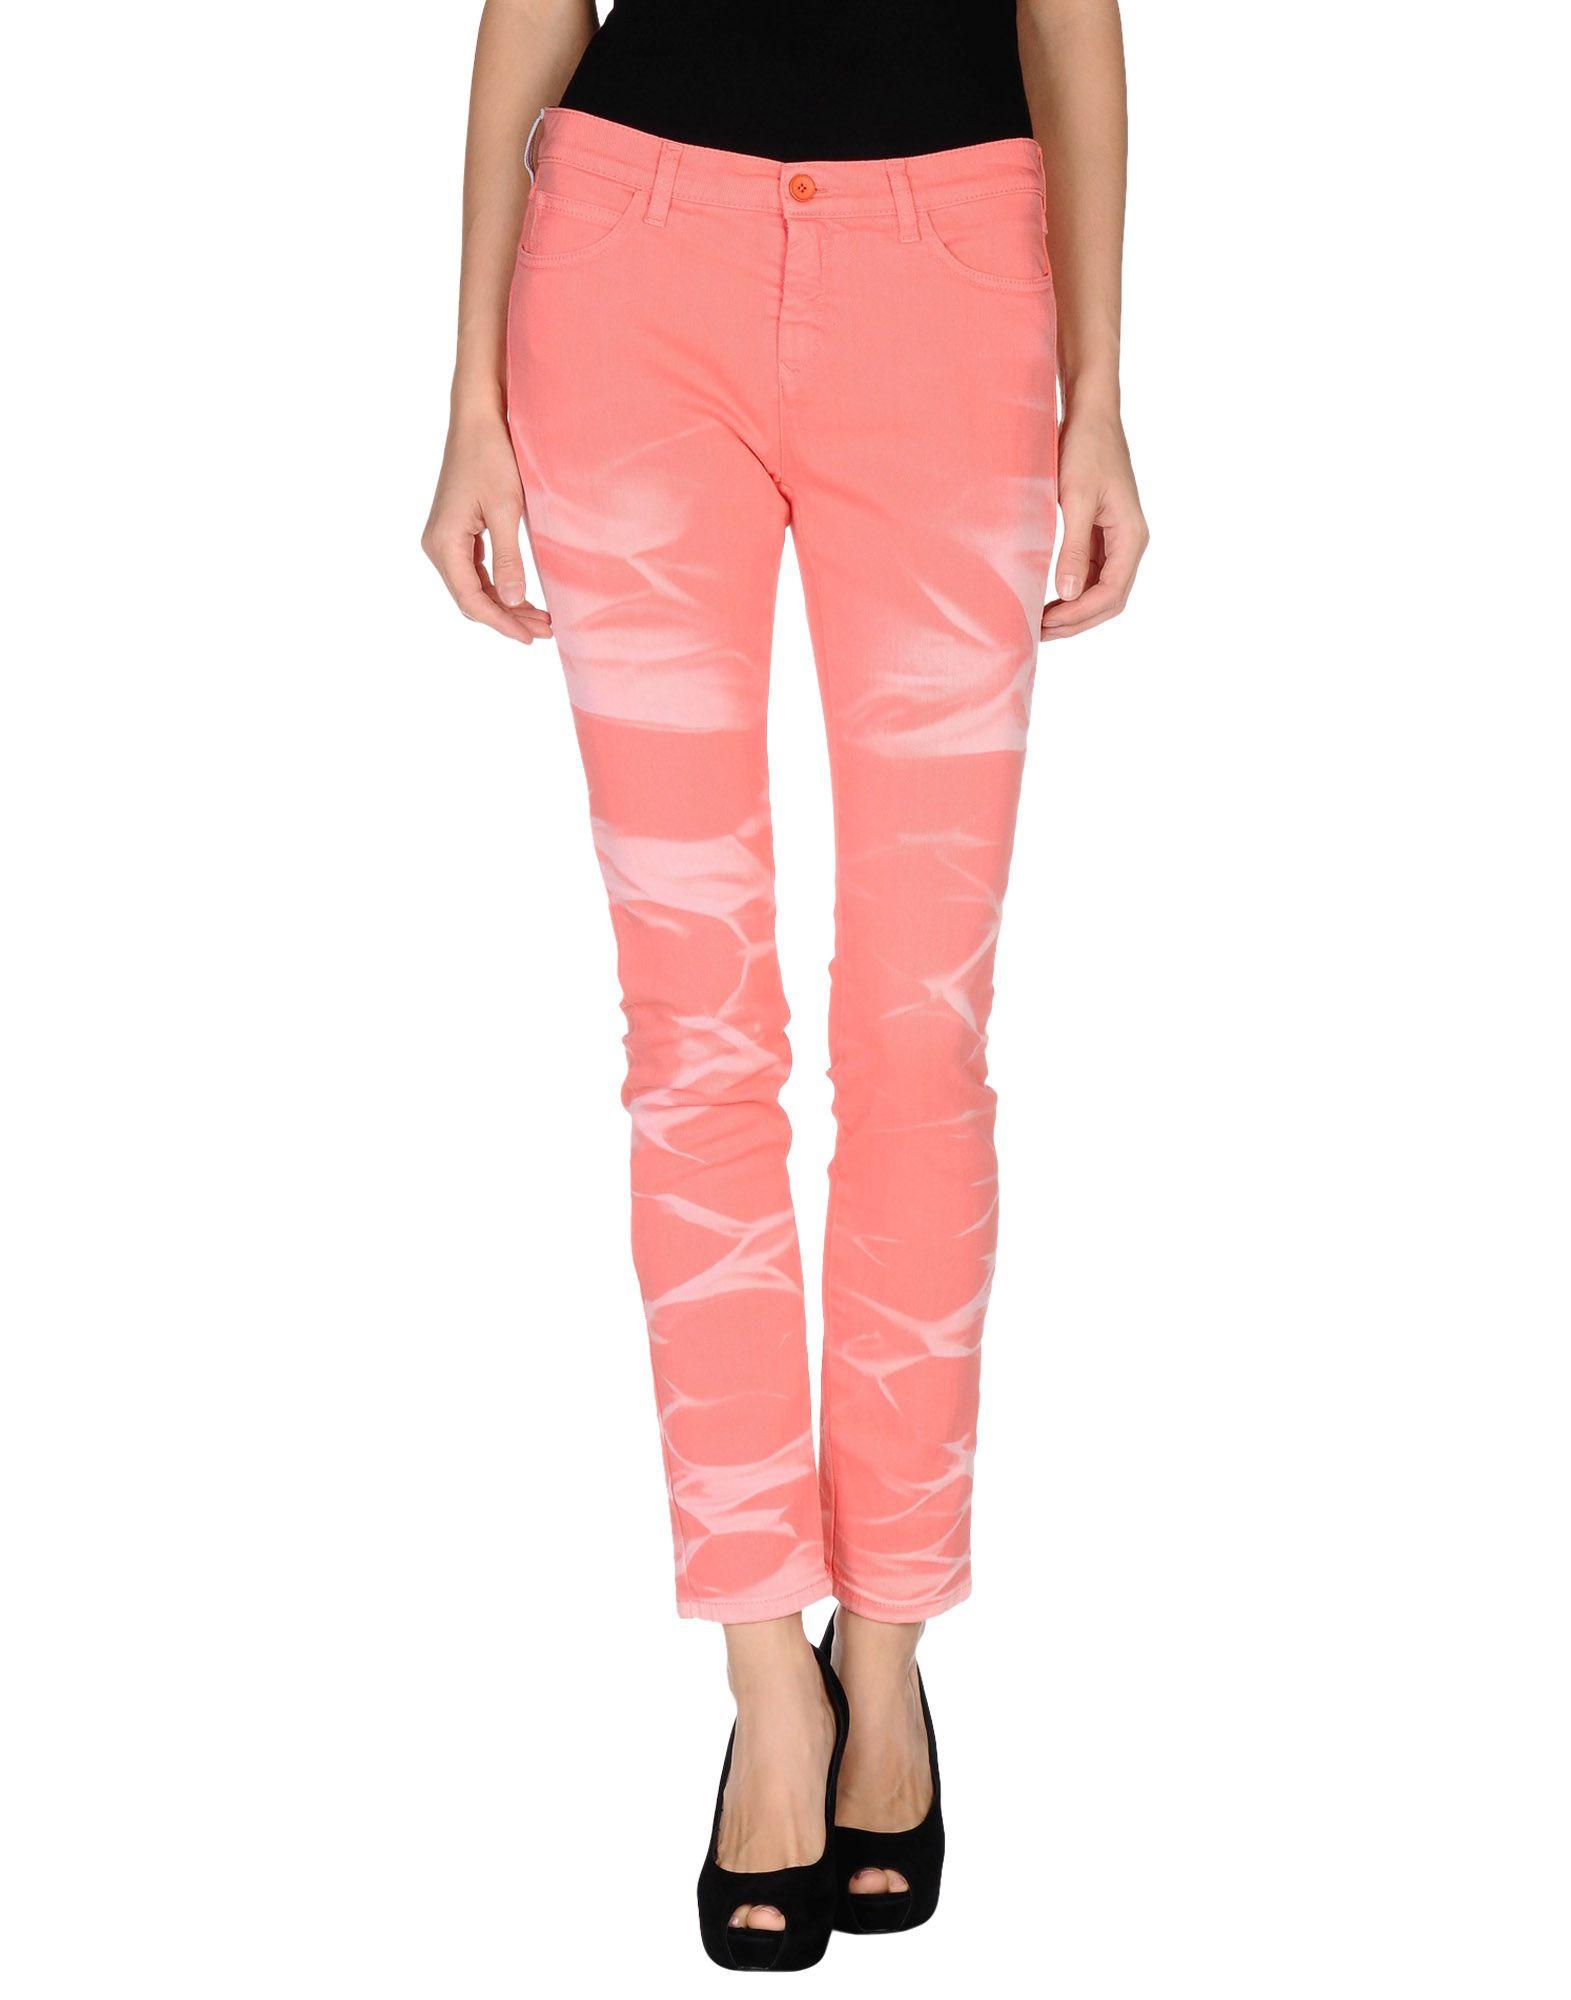 Lyst mm6 by maison martin margiela denim pants in pink for 10 moulmein rise la maison